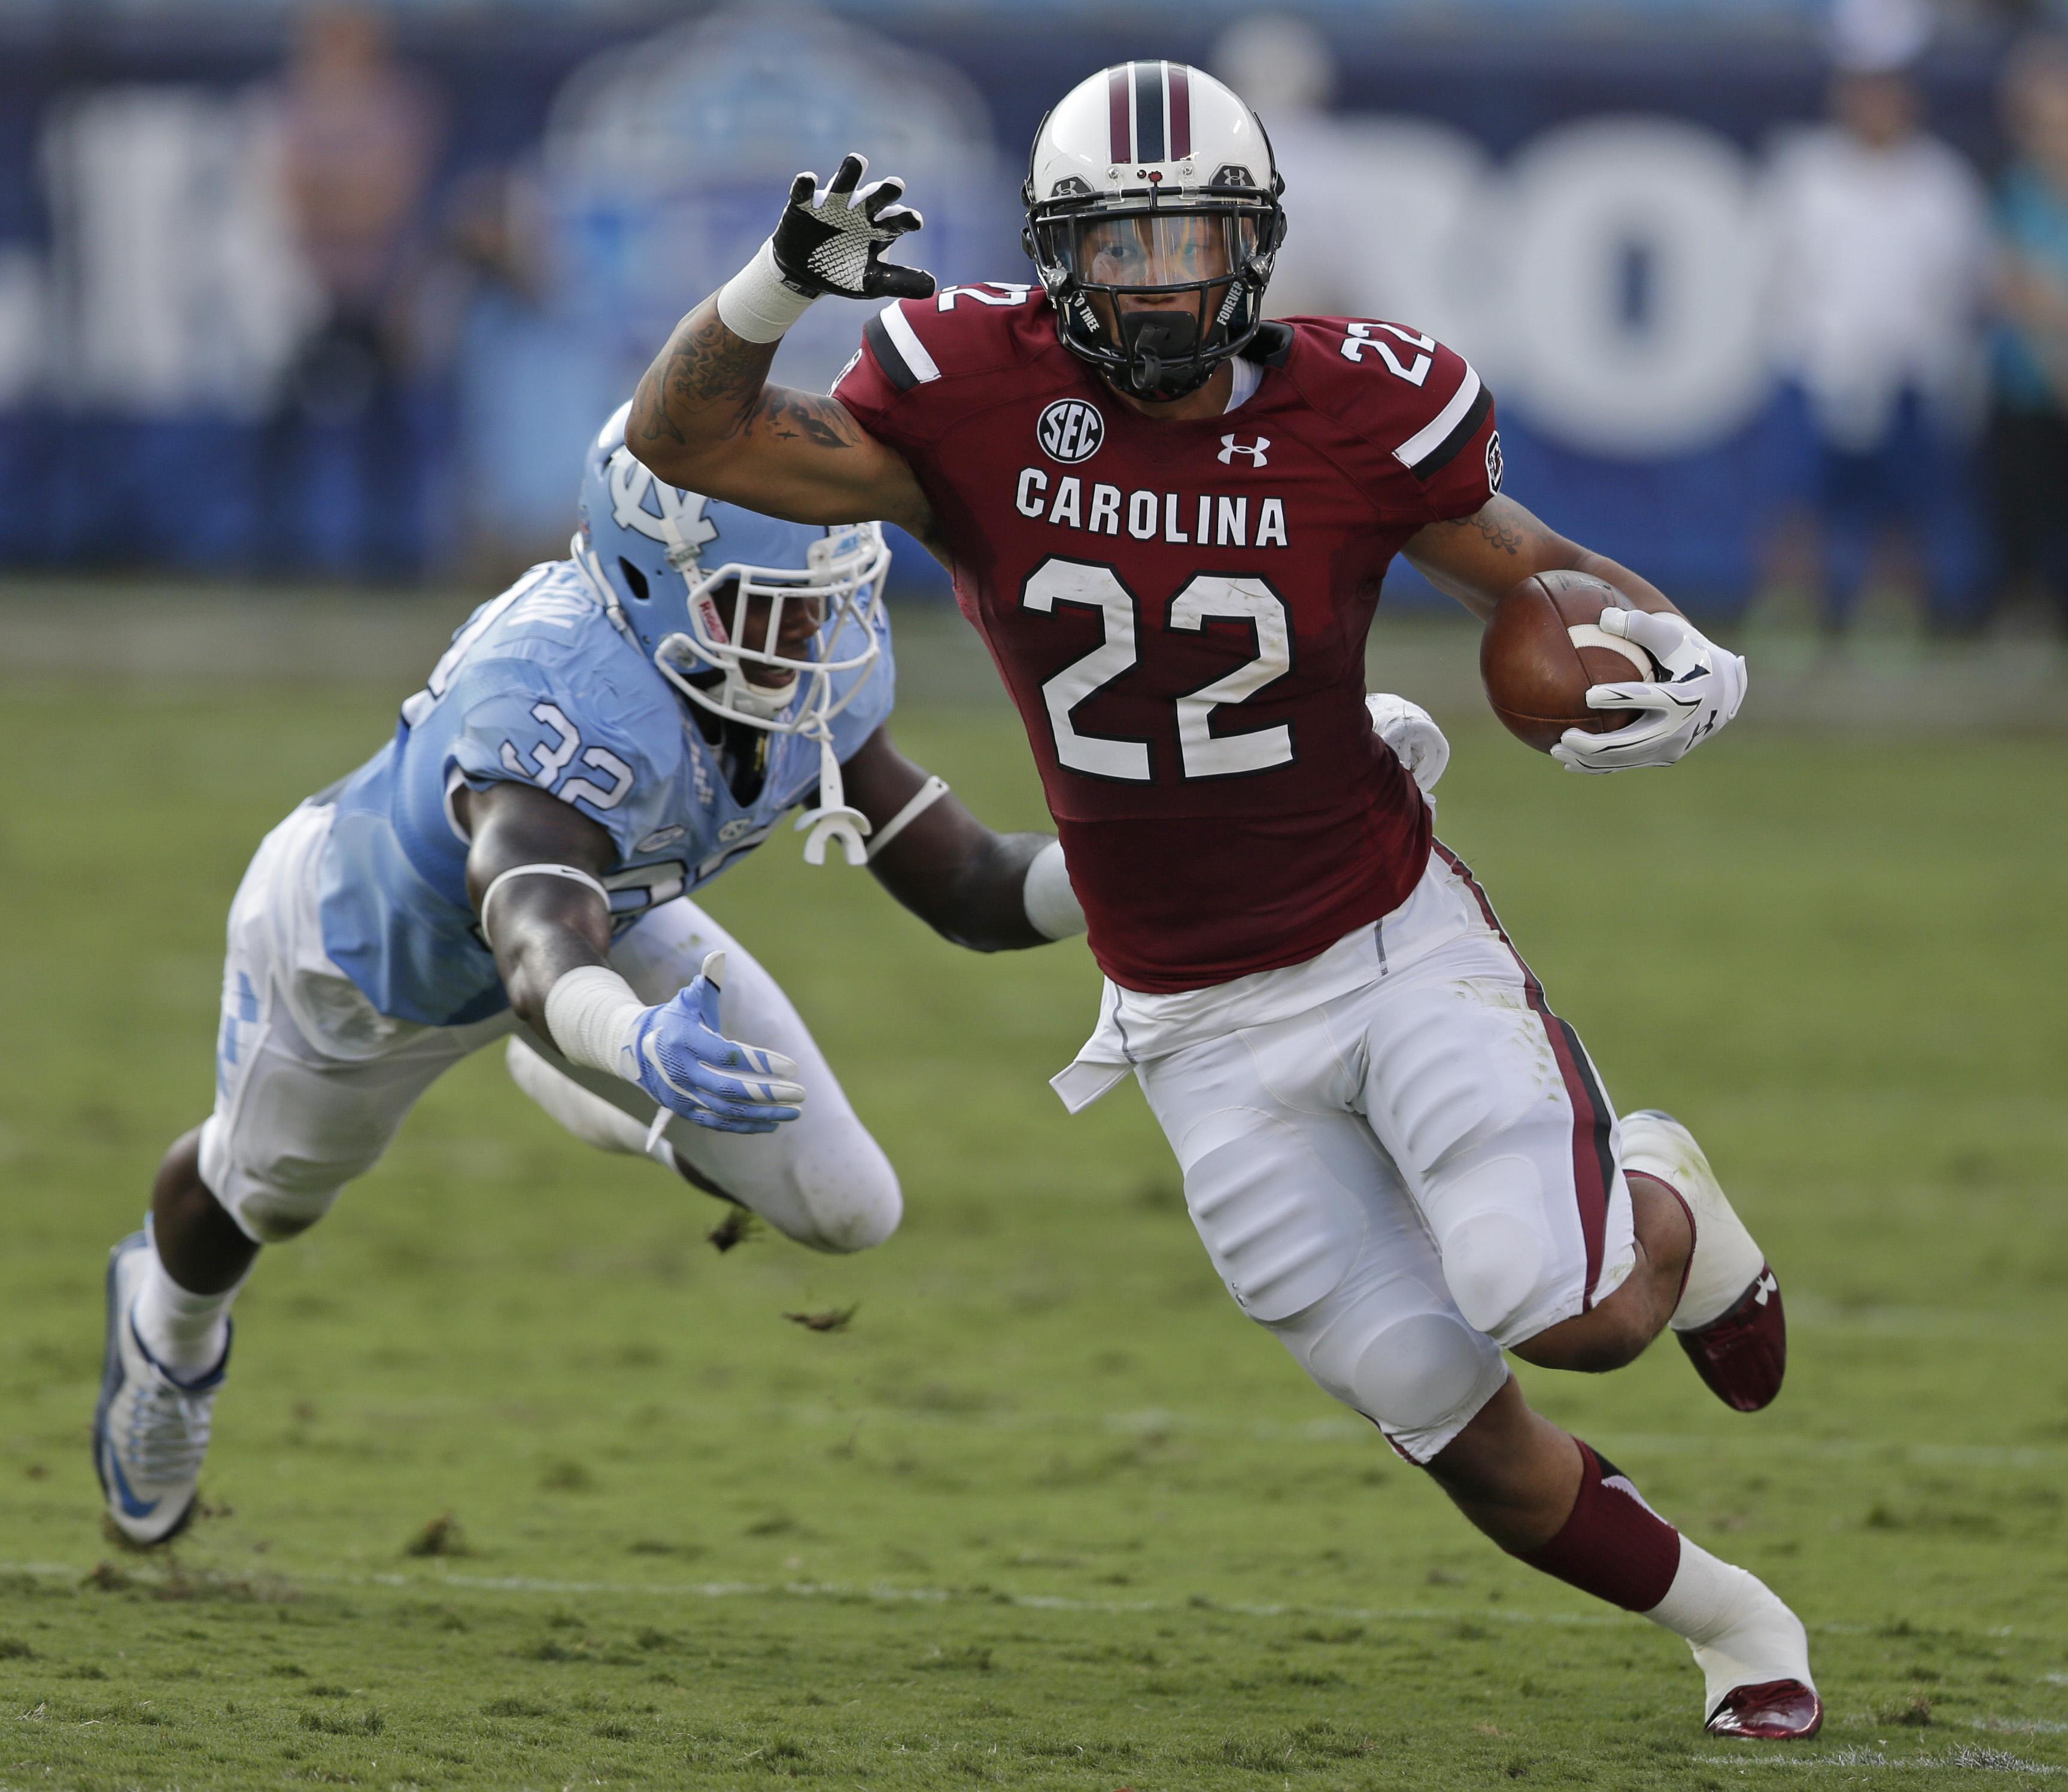 South Carolina's Brandon Wilds (22) runs past North Carolina's Joe Jackson (32) in the first half of an NCAA college football game in Charlotte, N.C., Thursday, Sept. 3, 2015. (AP Photo/Chuck Burton)